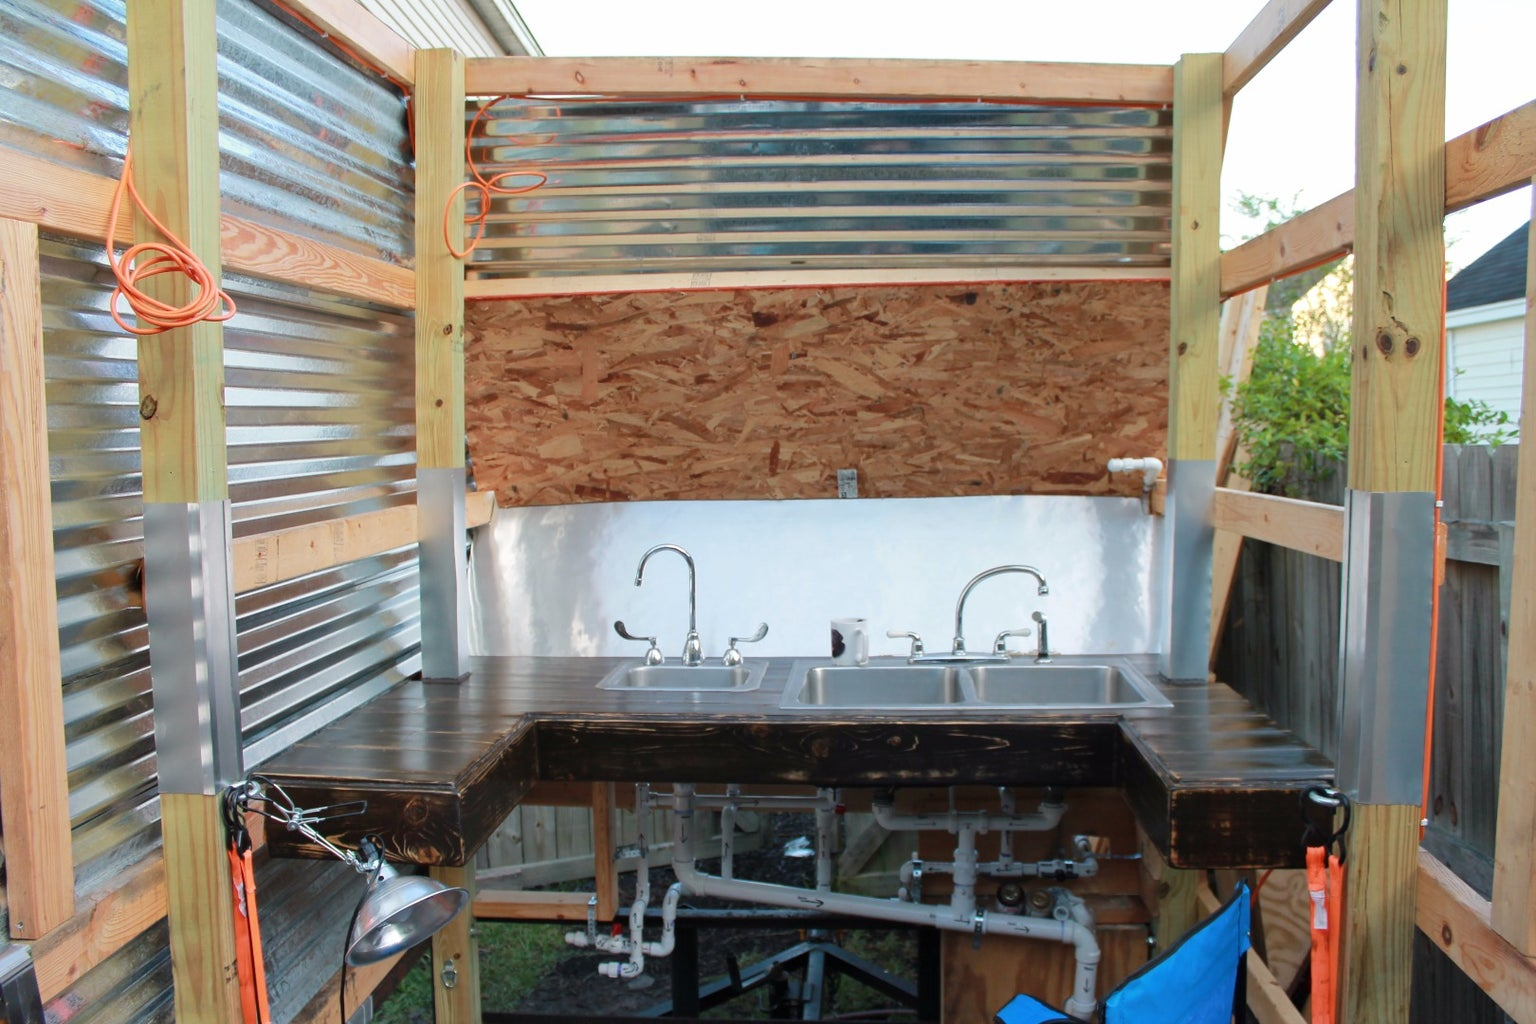 Adding the Metal Siding / Corrugated Metal Sheets